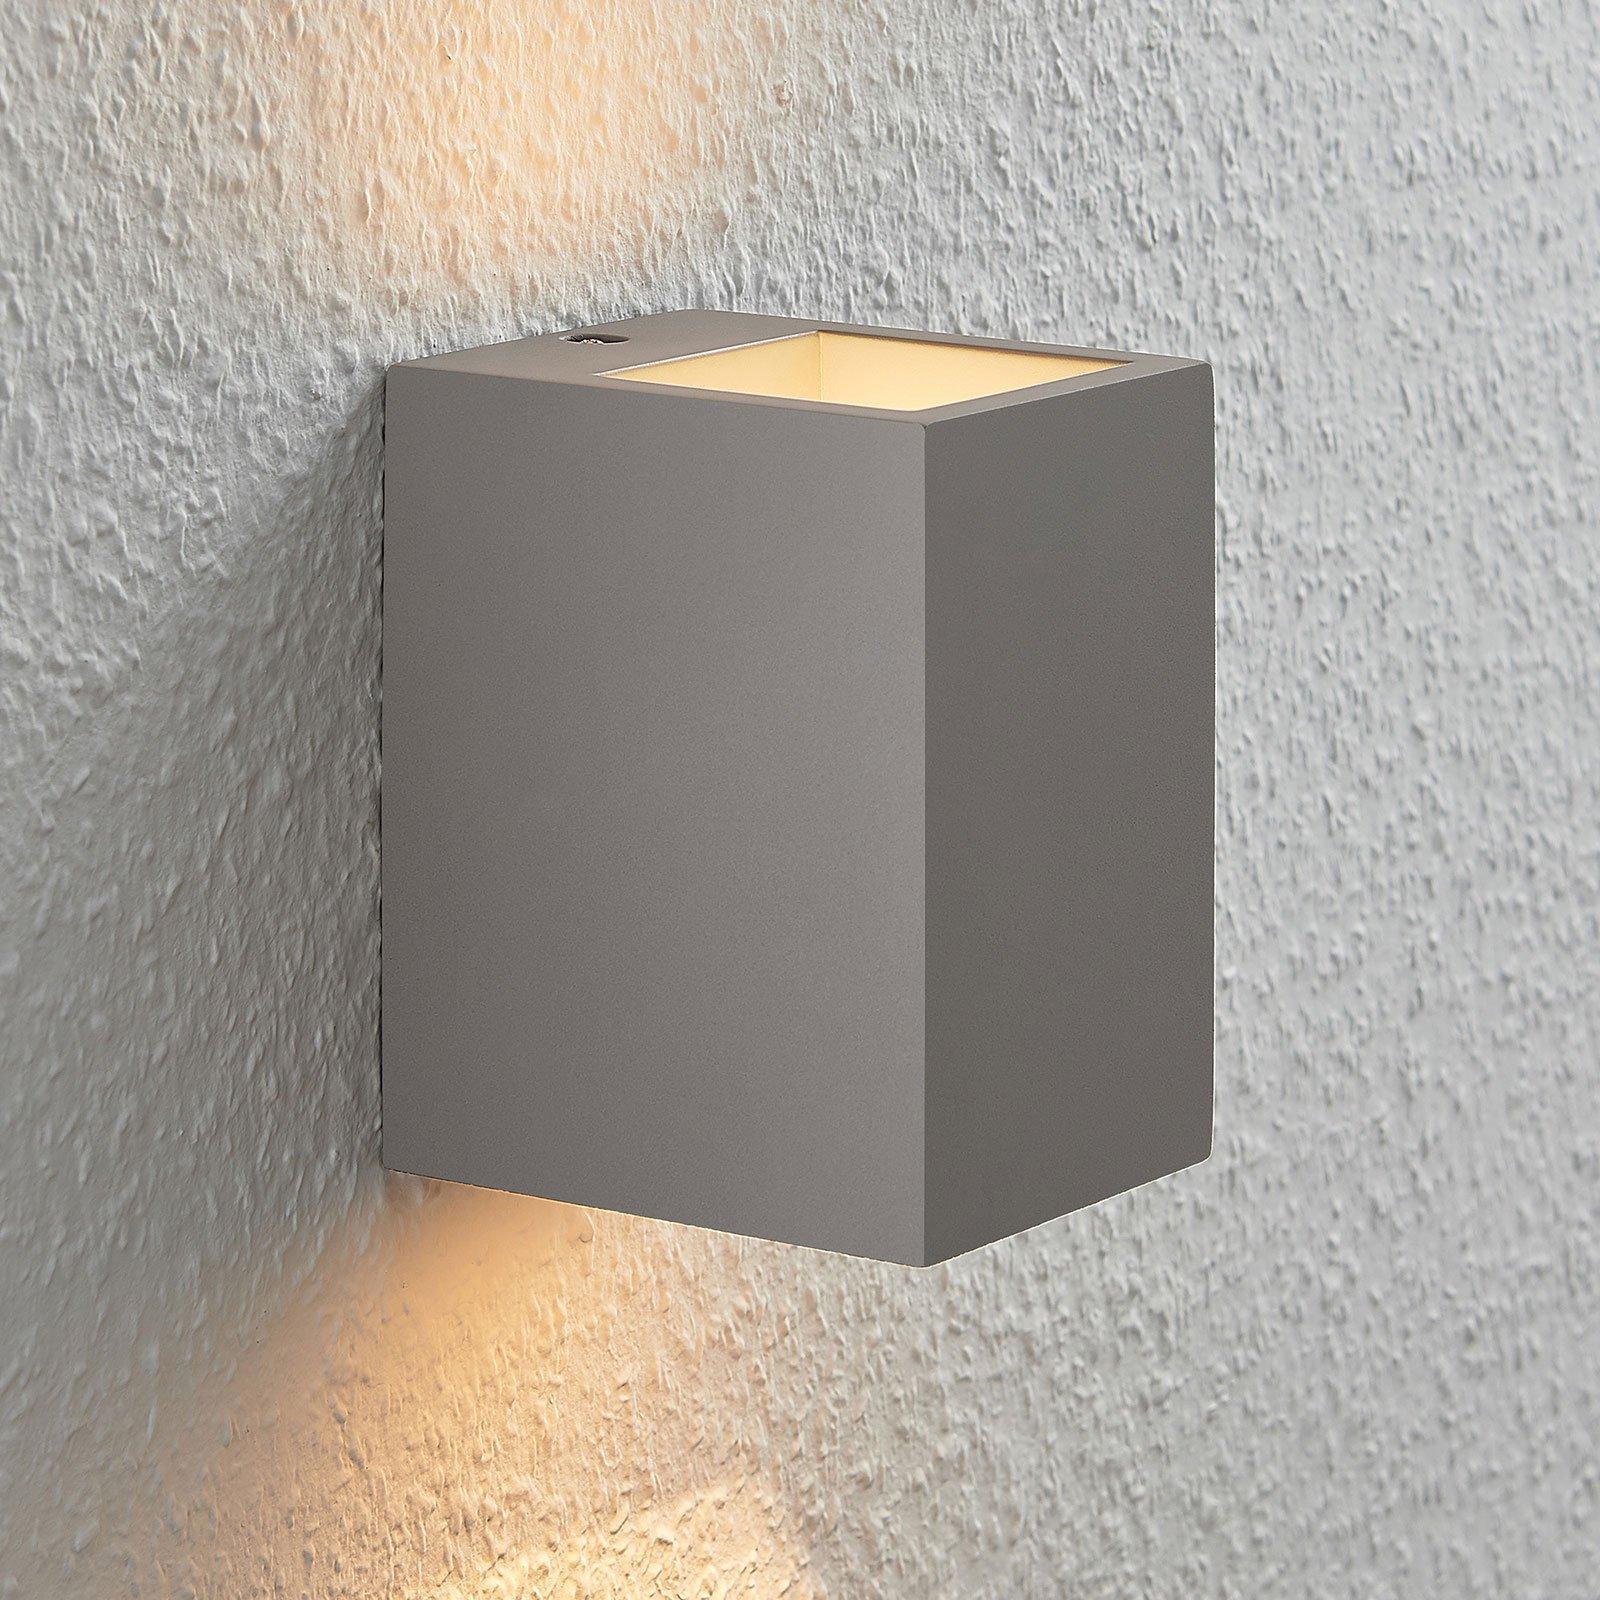 Betongvegglampe Smira i grått, 12,5x15cm